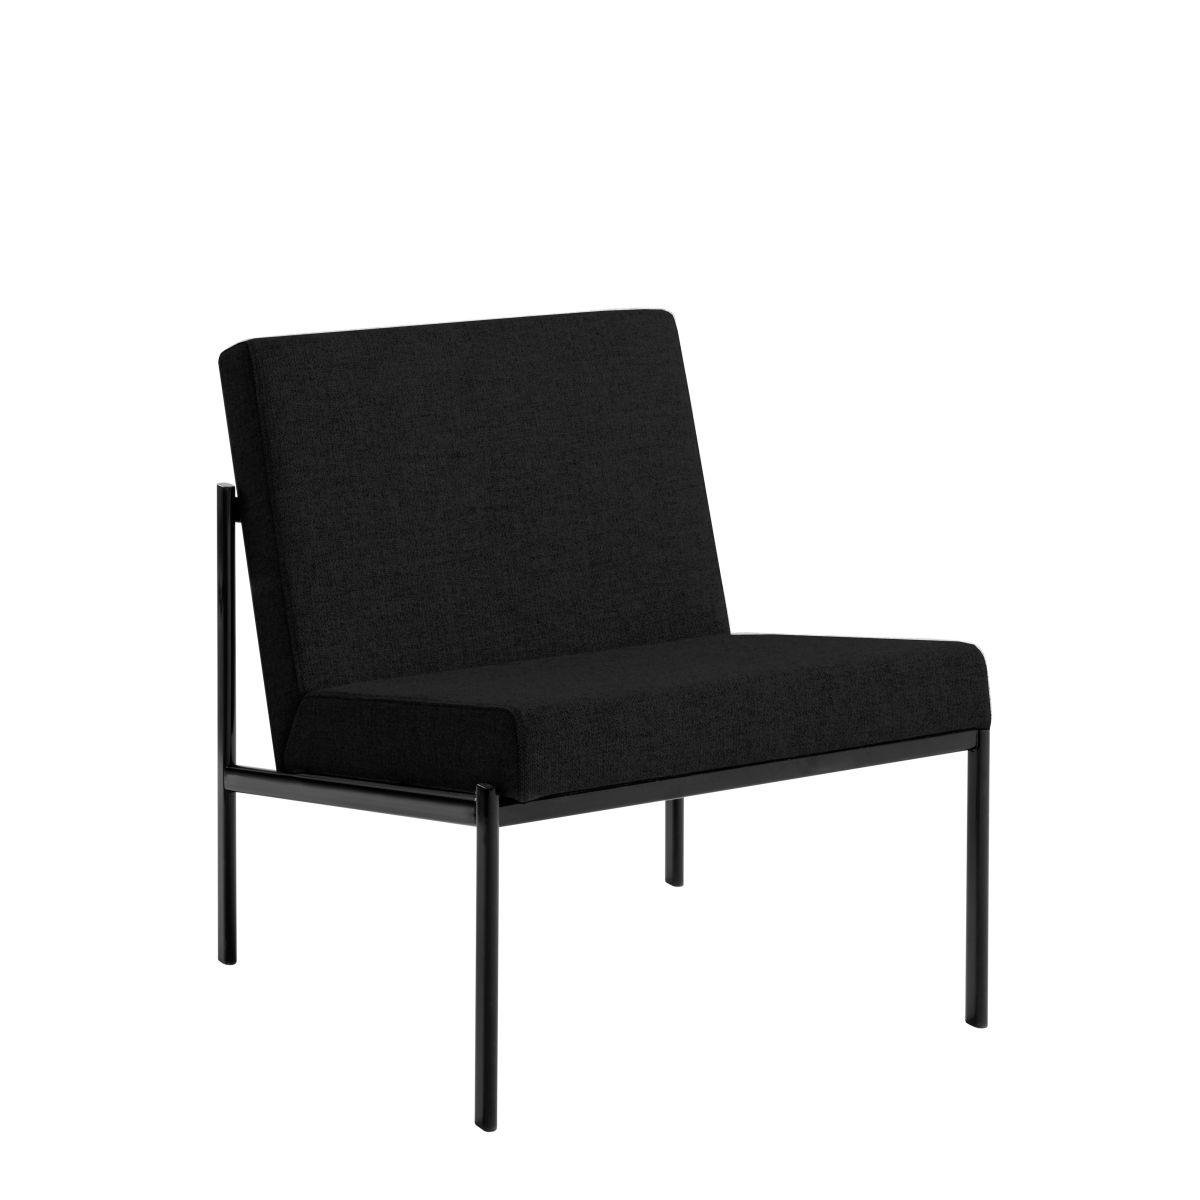 Kiki Lounge Chair black upholstery